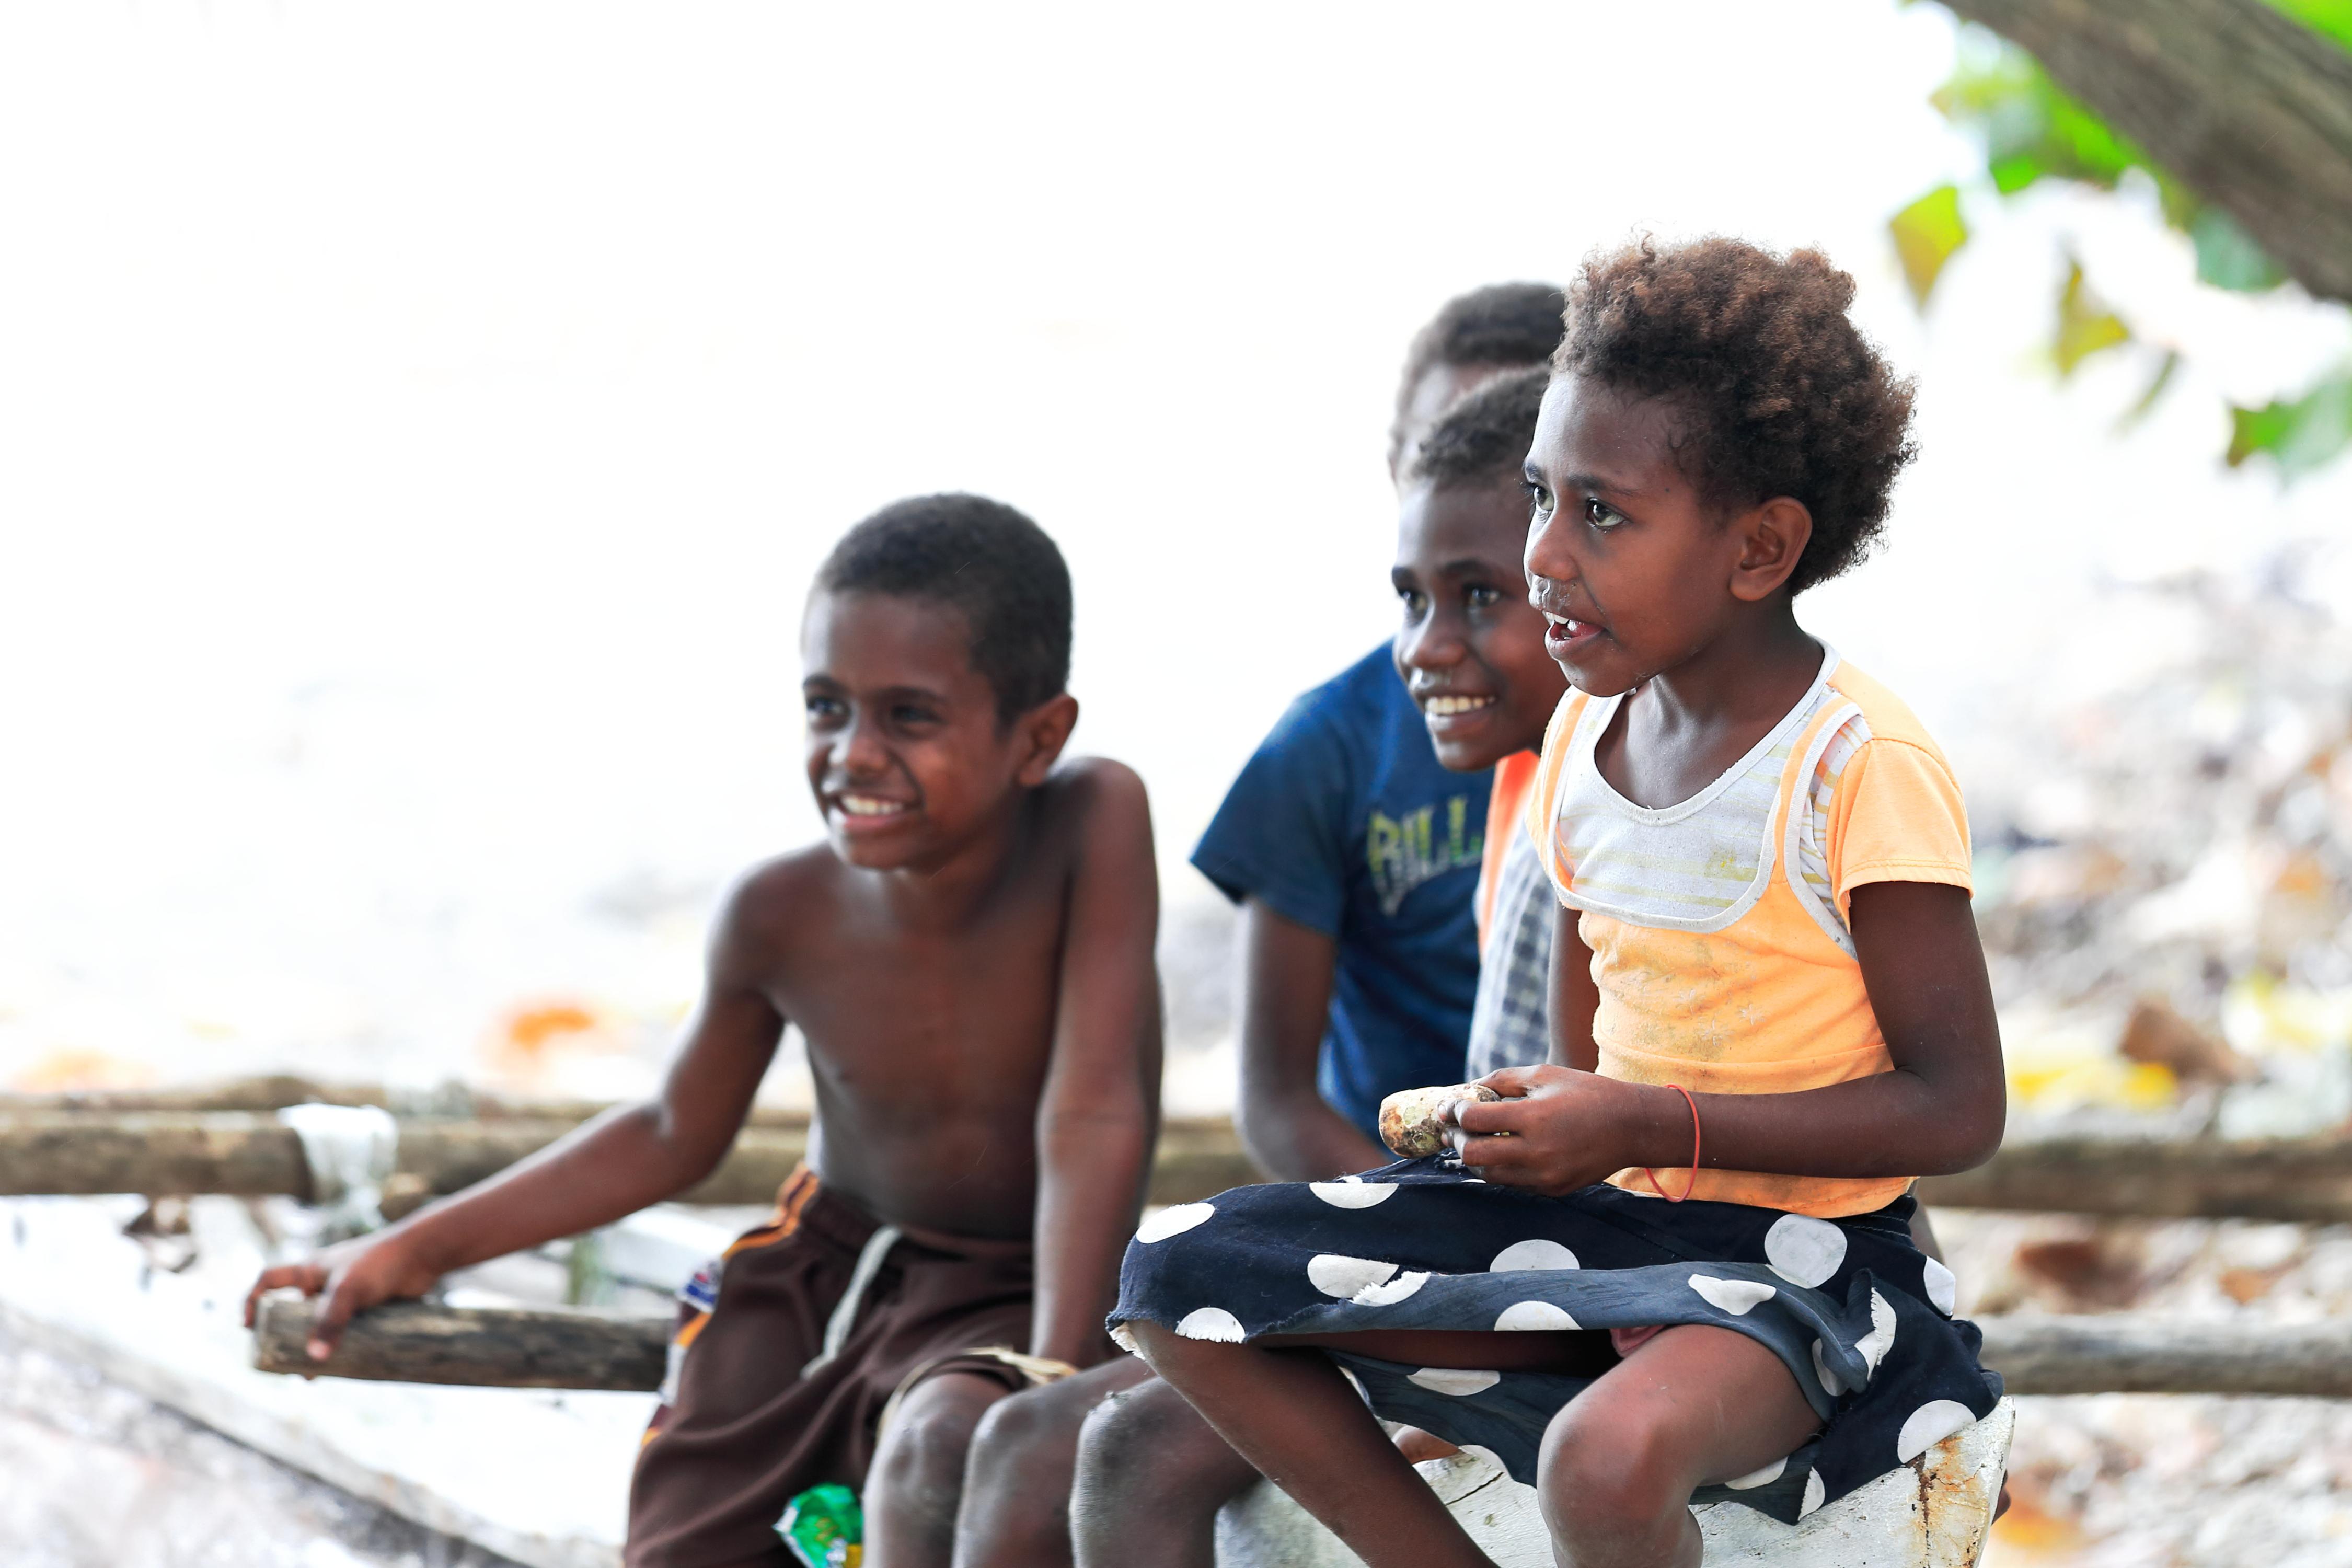 Ni-Vanuatu kids on the beach. Lamen Bay-Epi island-Vanuatu. 5400